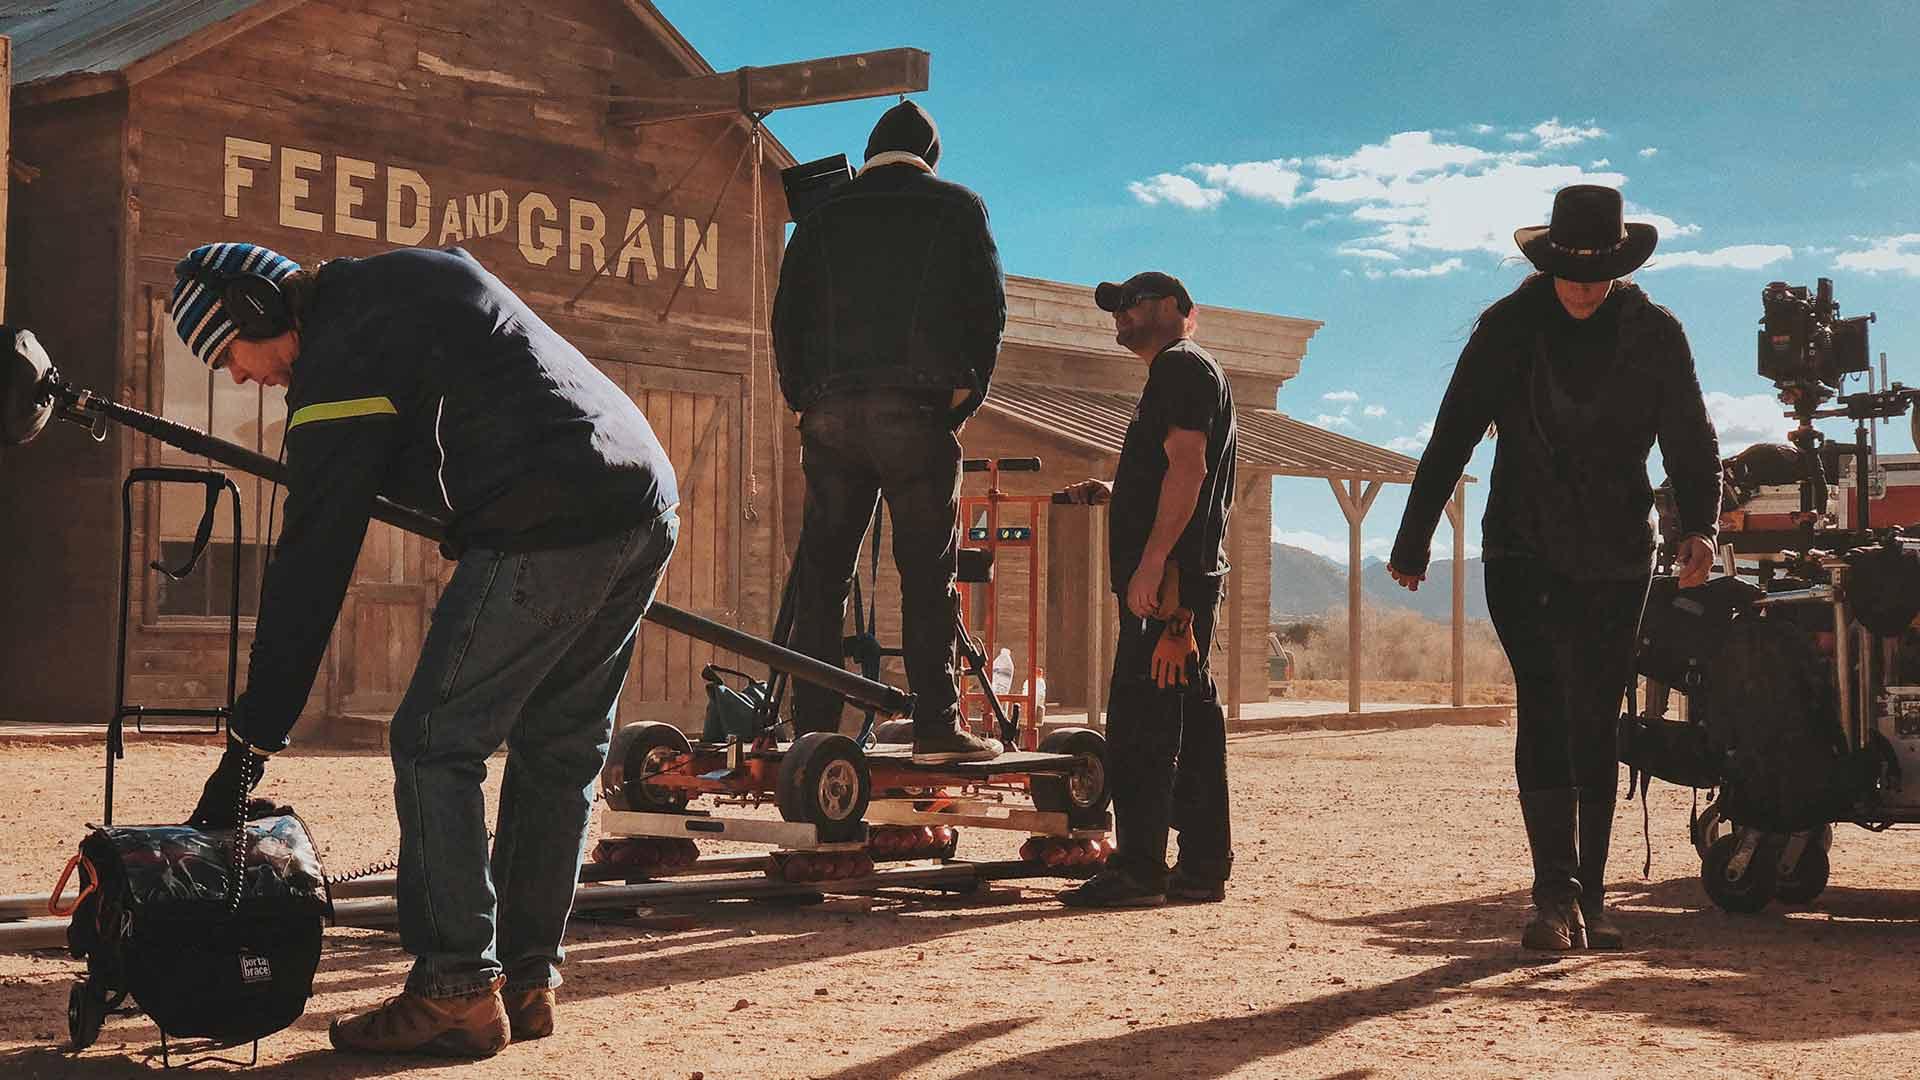 Film crew on set of western film